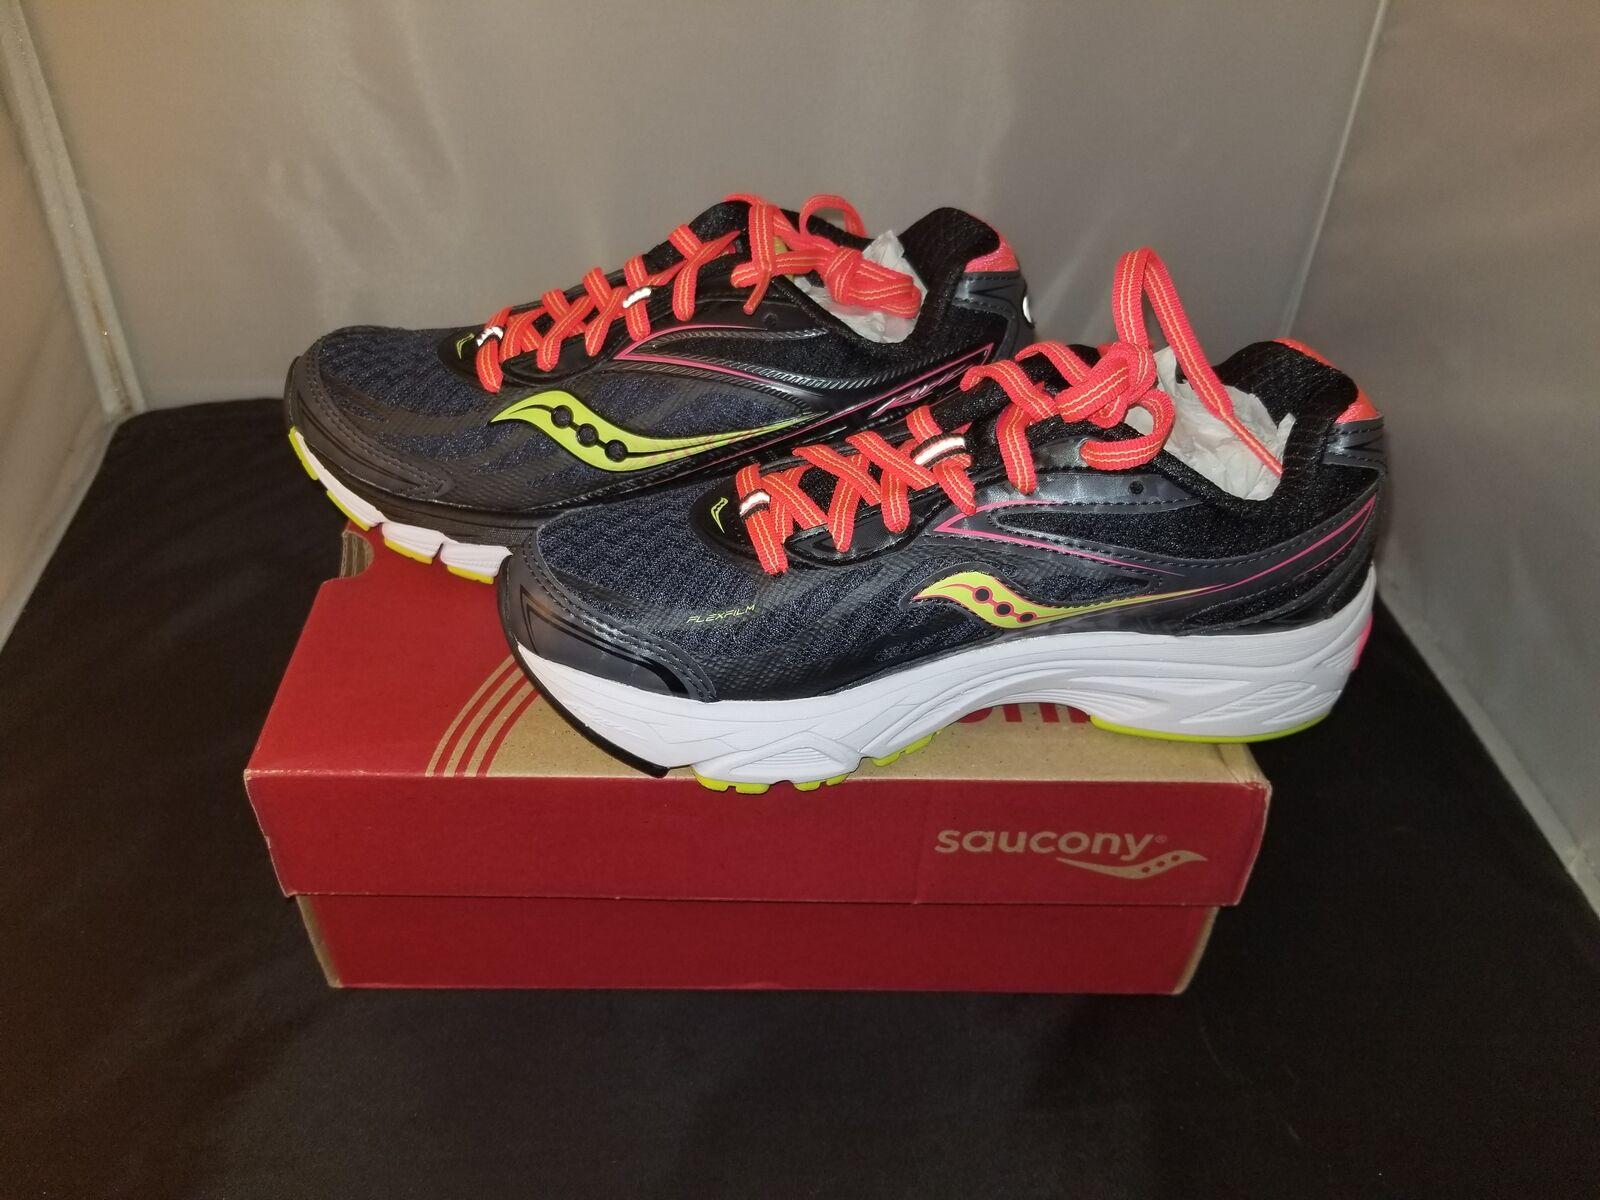 NIB Saucony Guide 8 Running Schuhes Dark Gray Farbe Größe 5 US/3 UK/35.5 EUR NEU